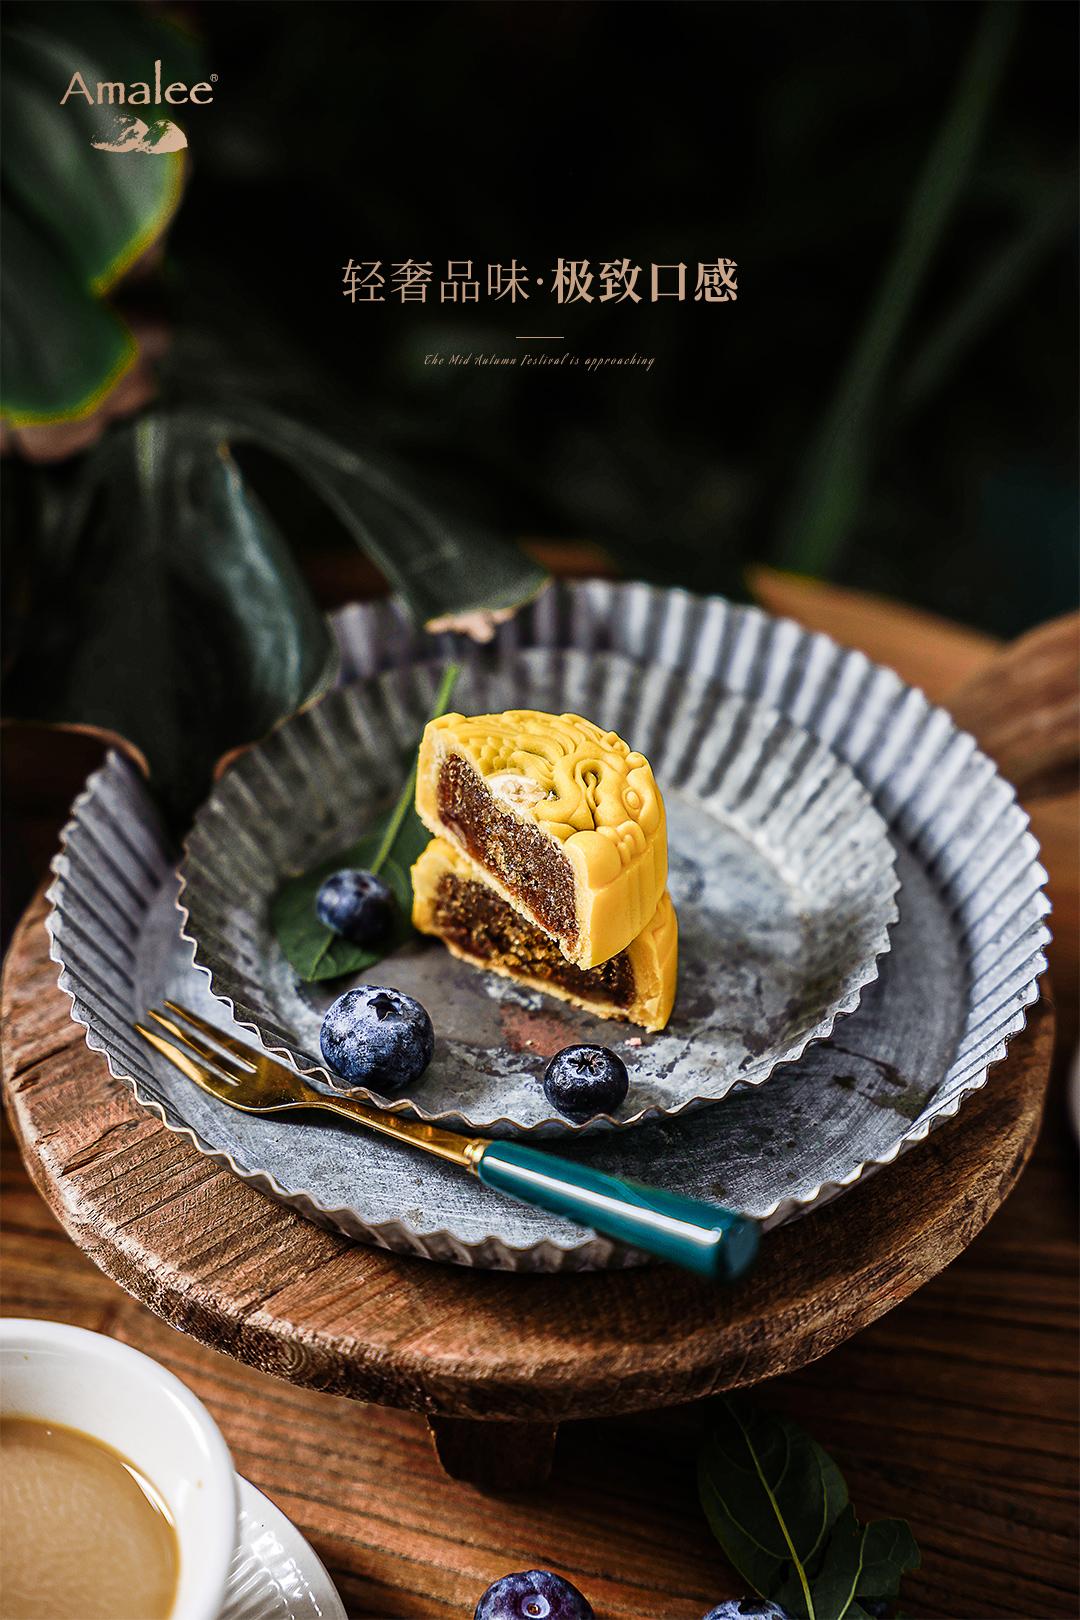 Amalee Birdnest mooncake nutrient